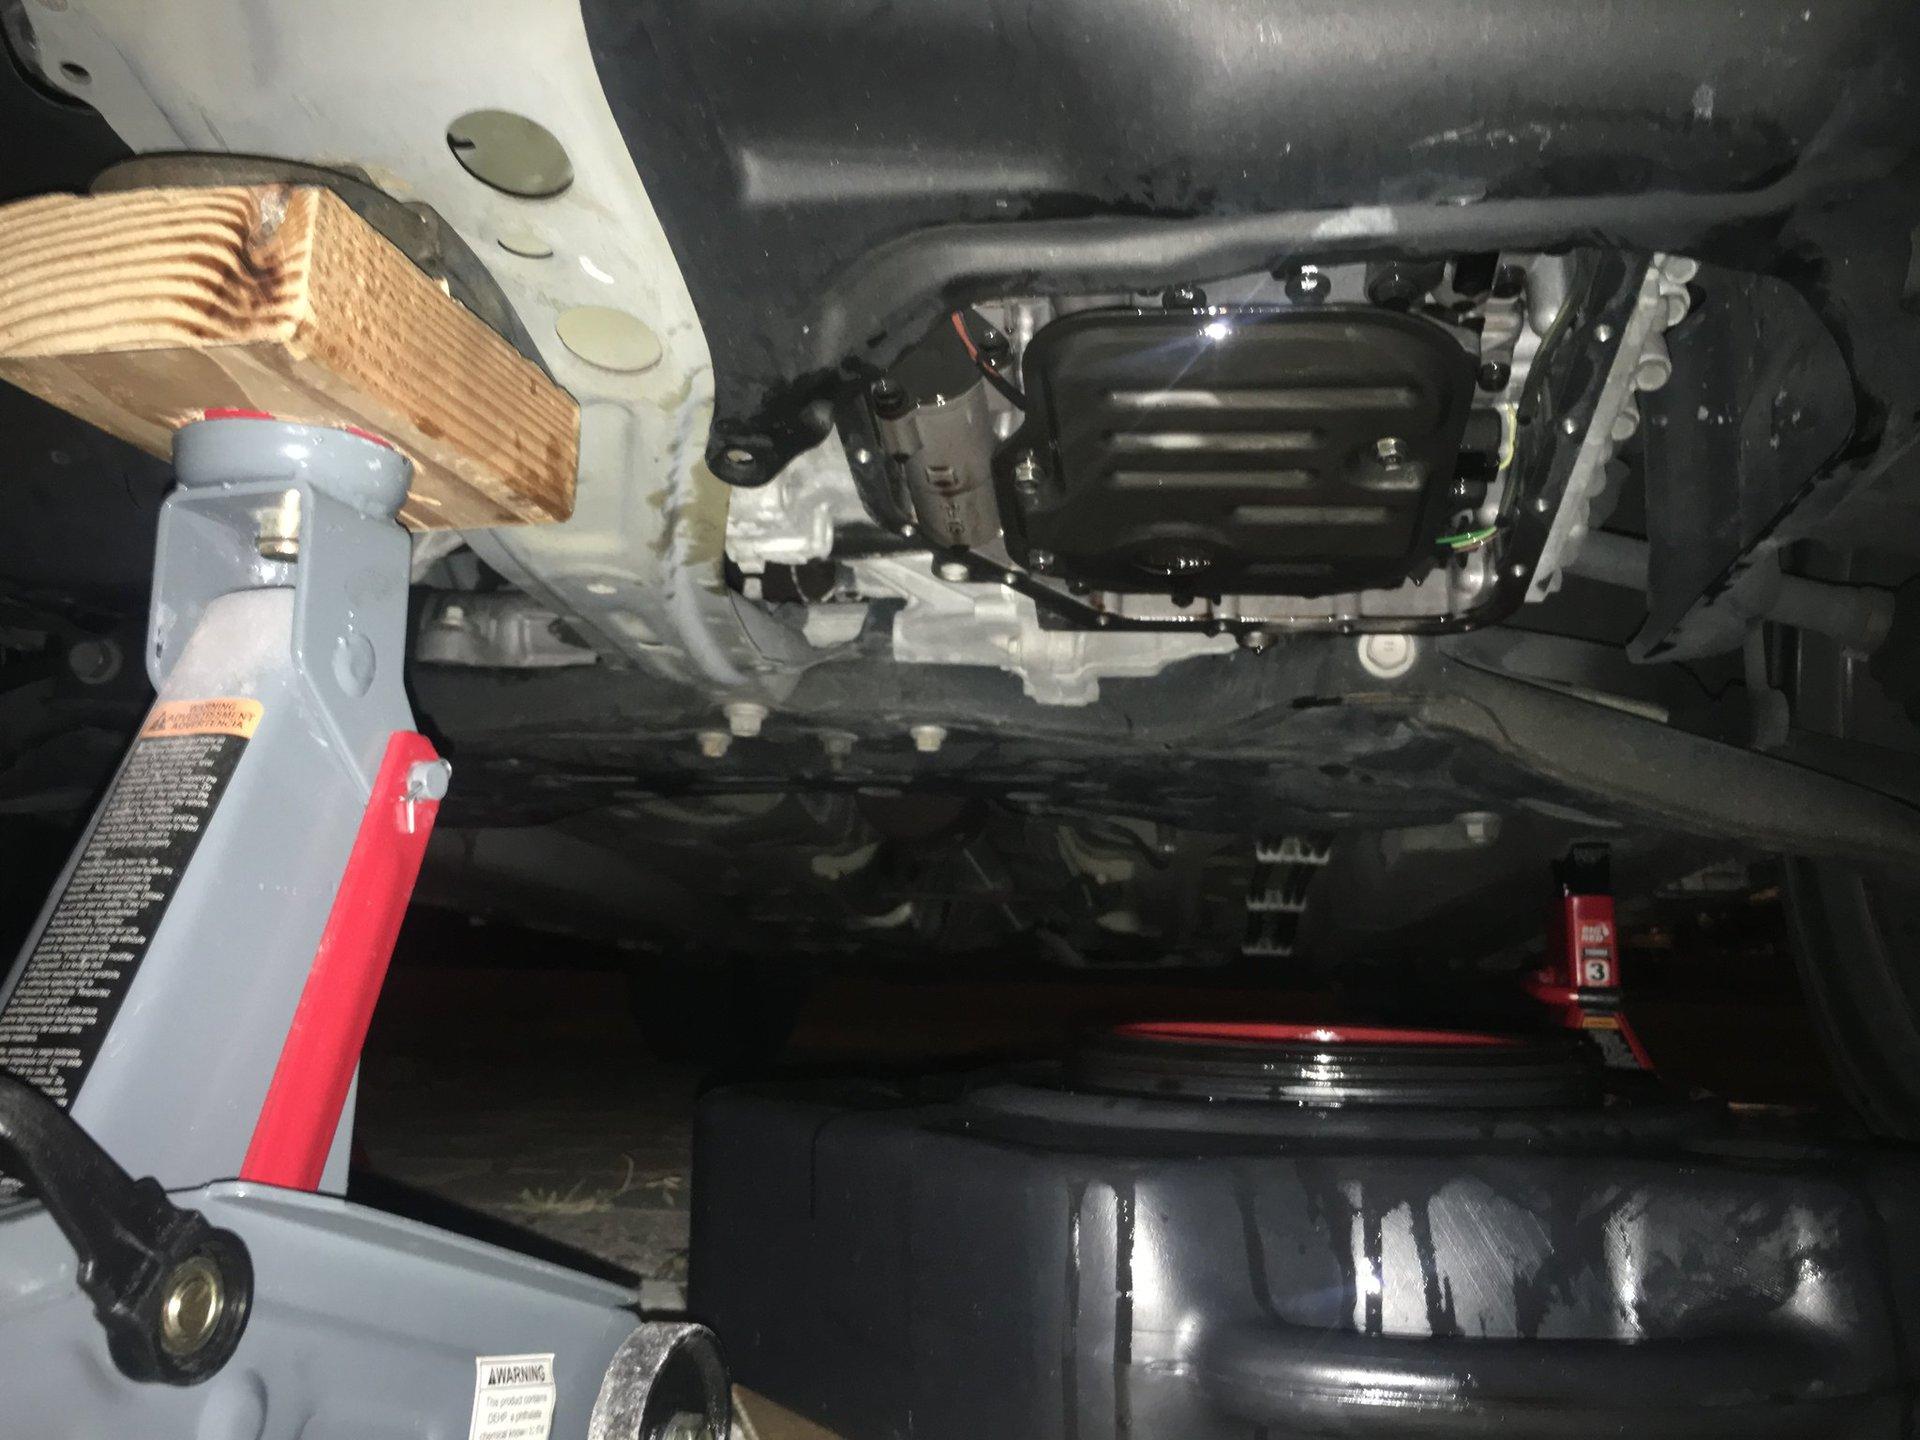 2013 Corolla A/T (U341E) Transmission Slipping in Drive/3/2